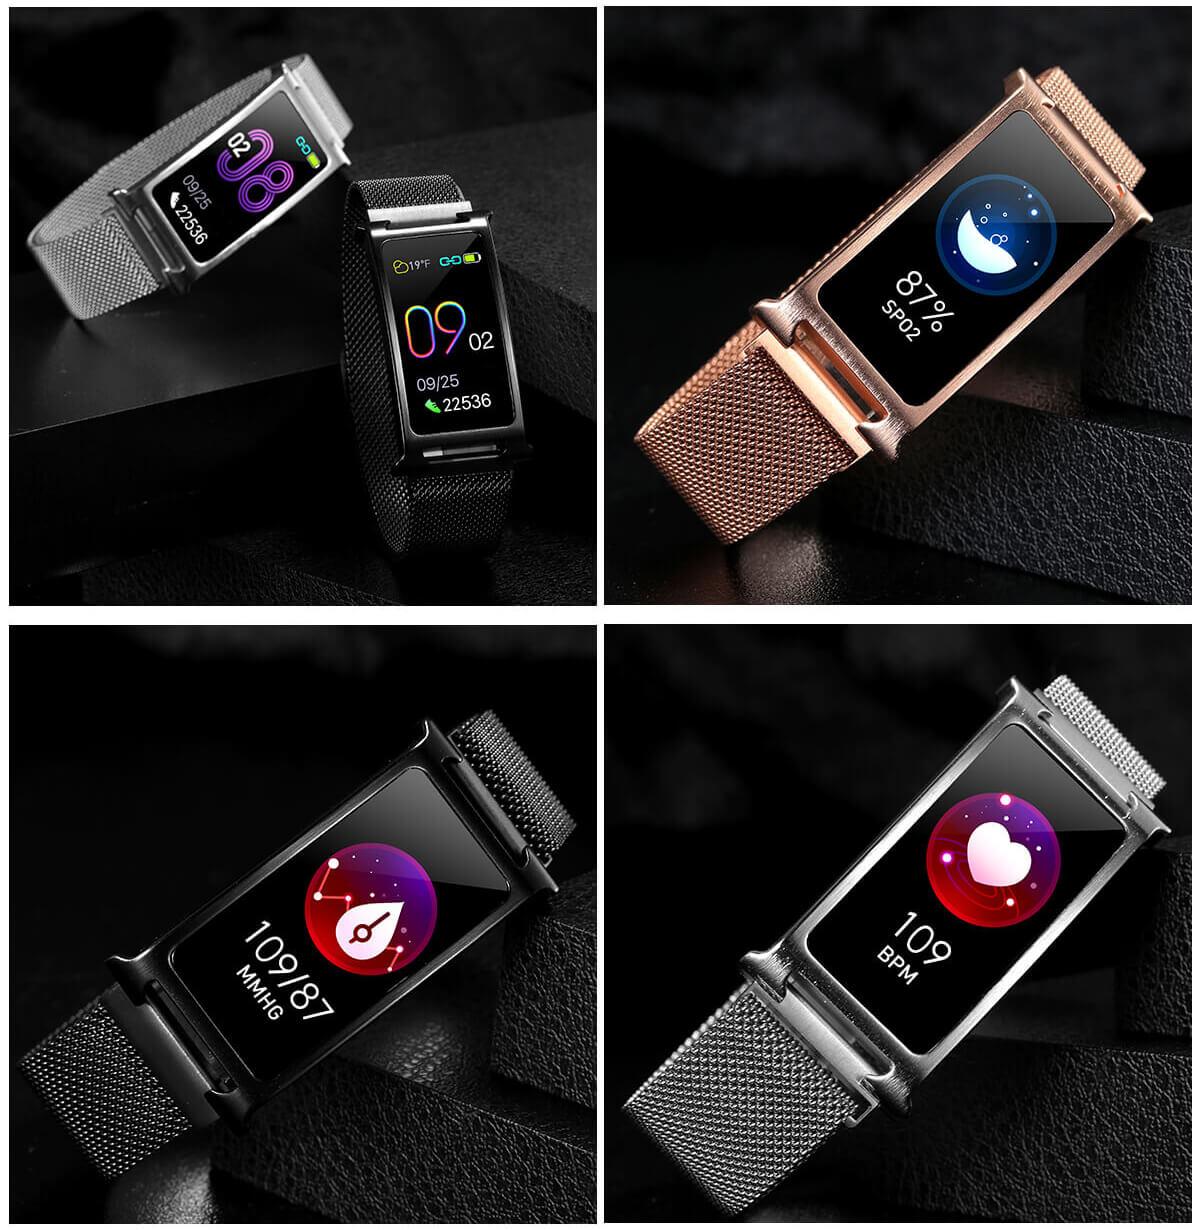 Chytrý kovový fitness náramek Smartomat Silentband 2 chytré hodinky 10